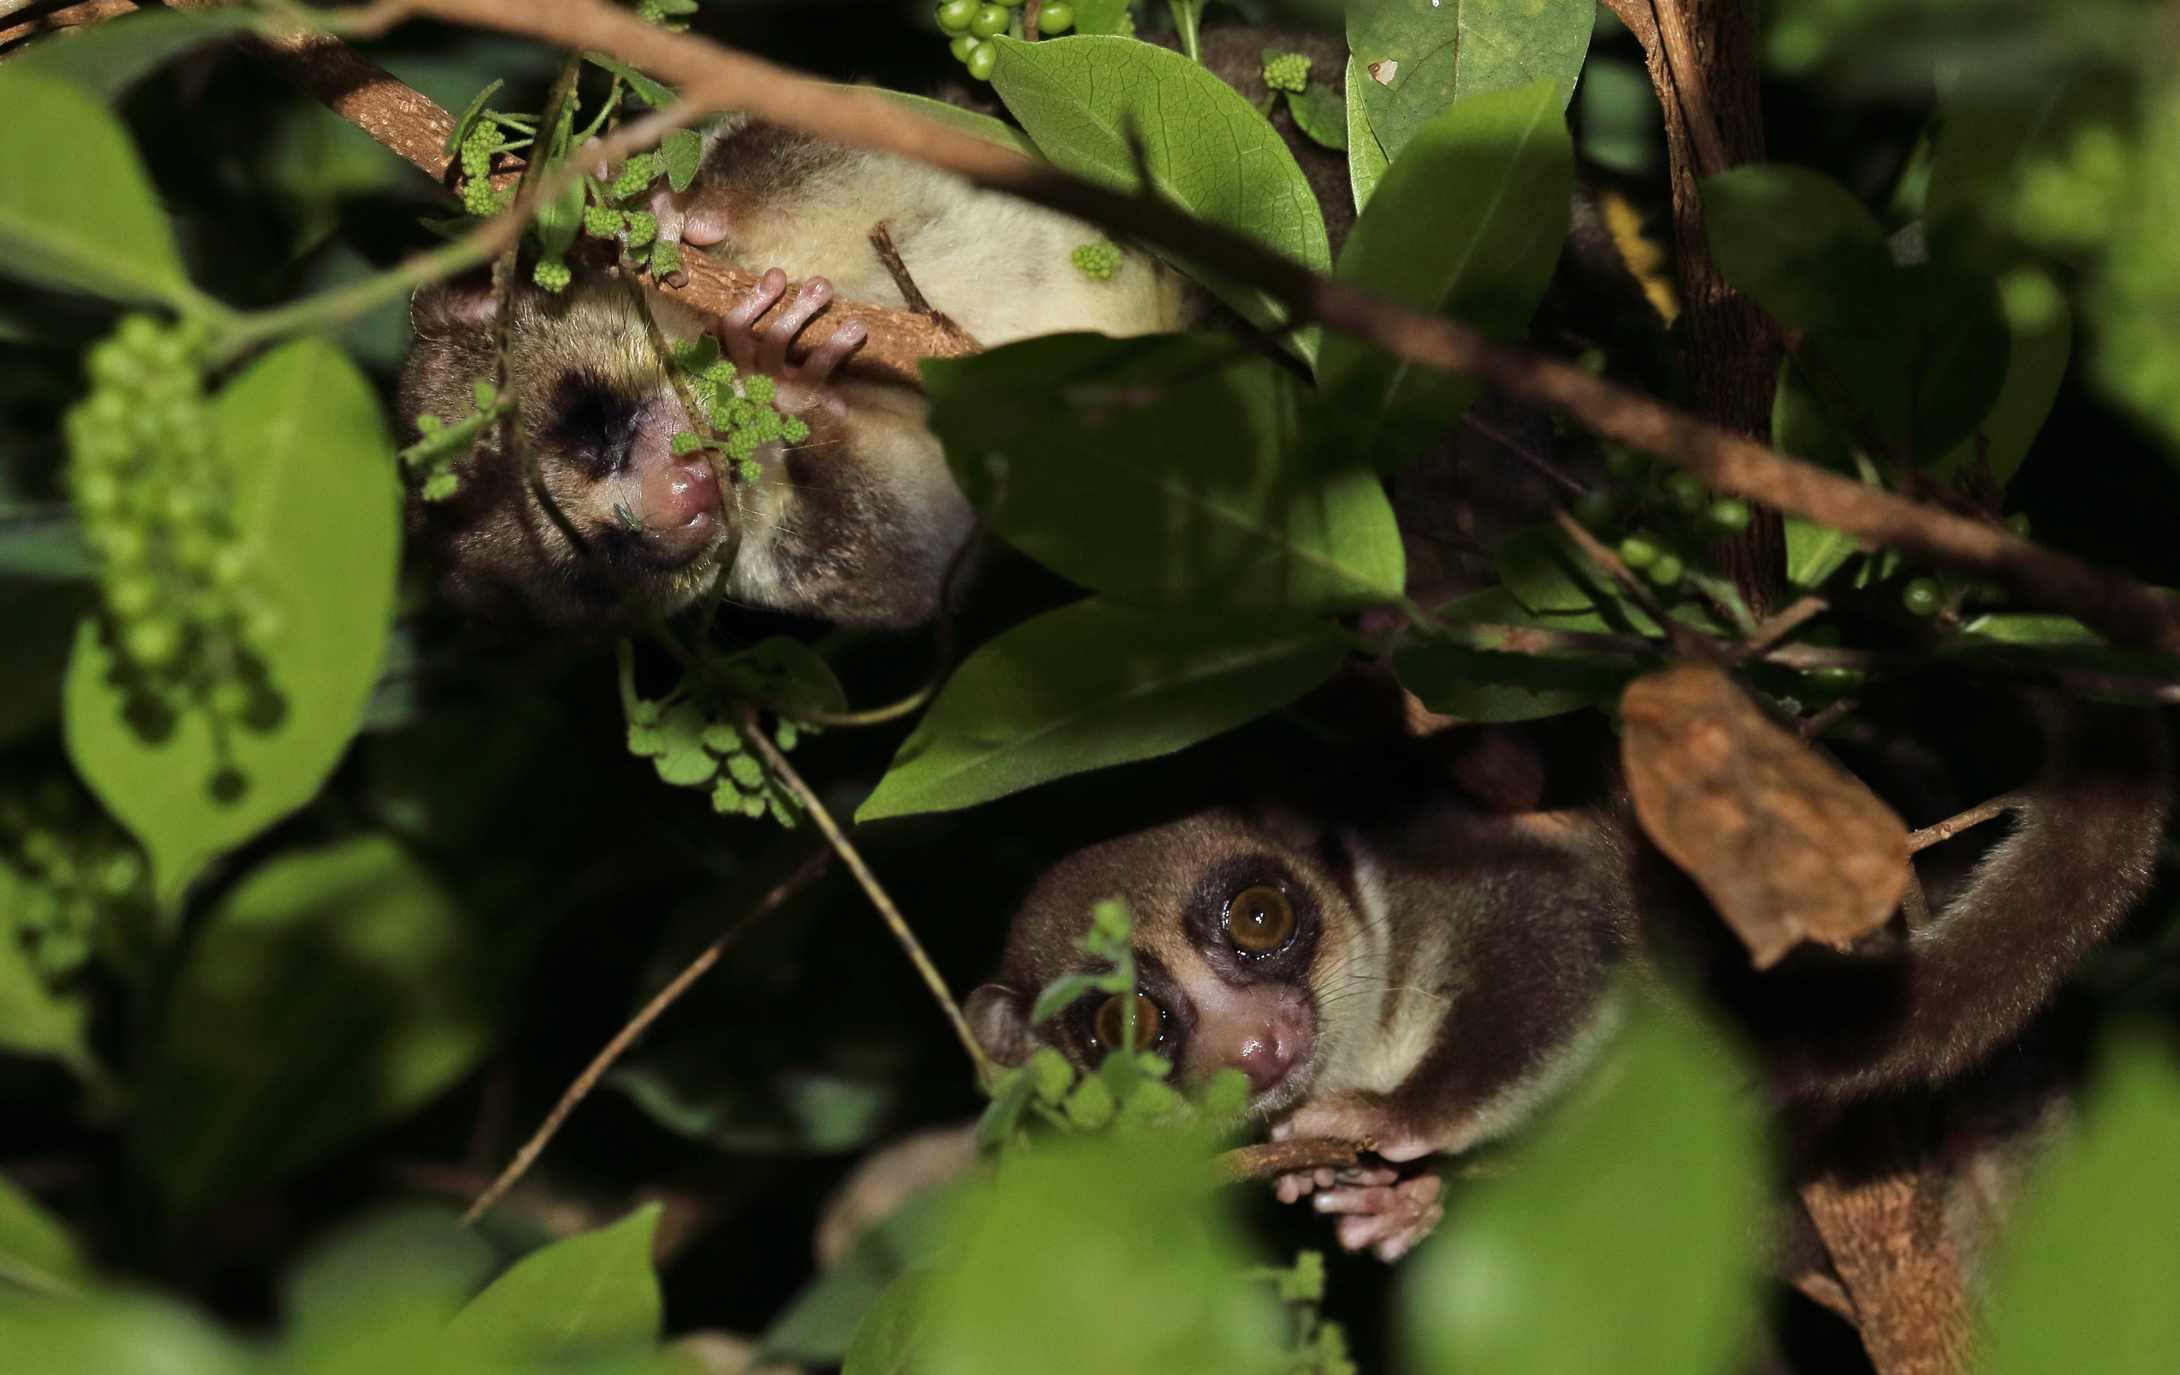 Fat-tailed Dwarf Lemur in tree at night.